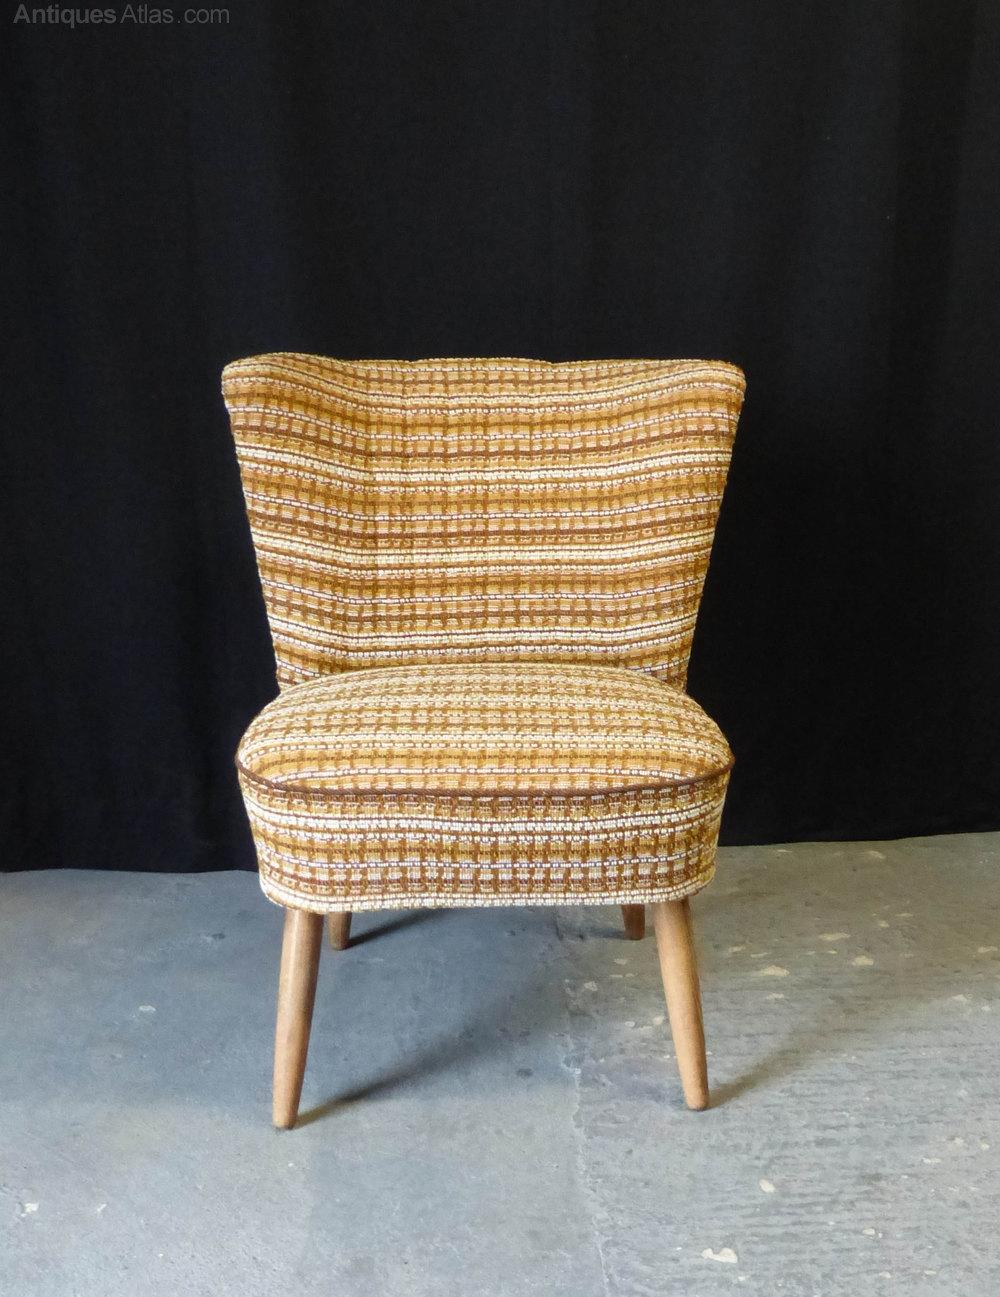 Vintage 1950s Bedroom Chair Boudoir Chairs vintage 1950s ... - Antiques Atlas - Vintage 1950's Bedroom Chair